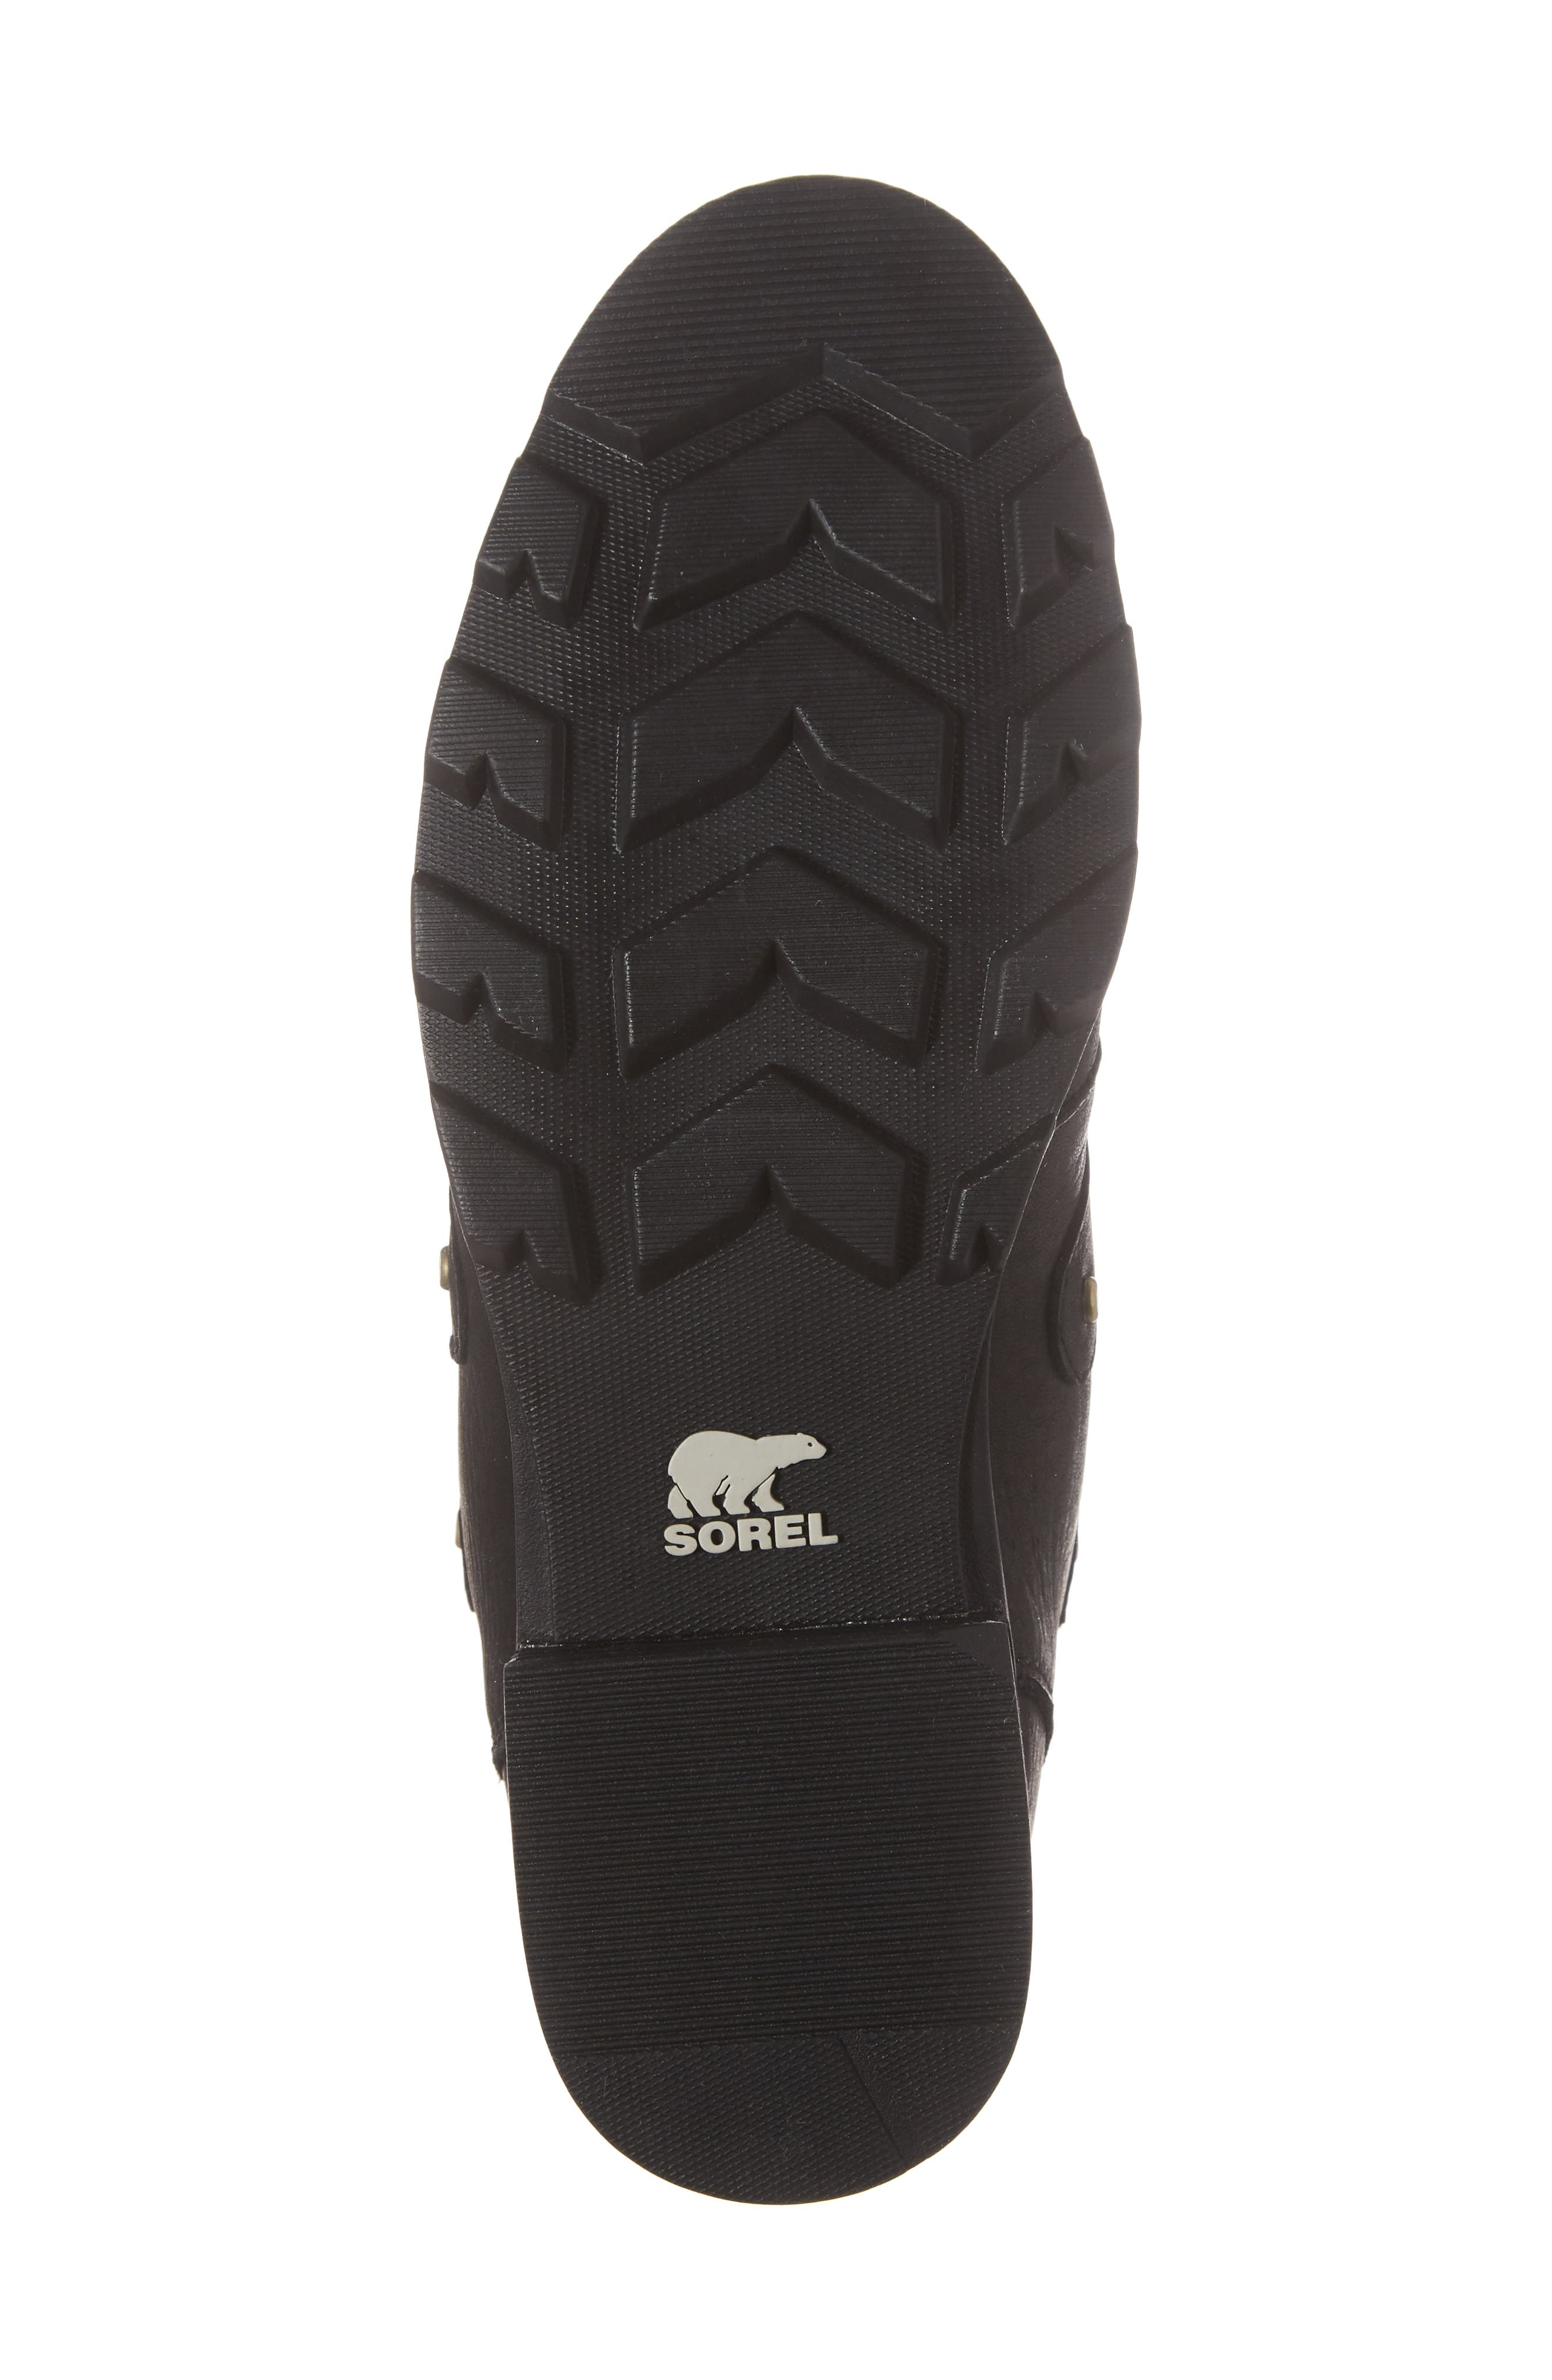 Emelie Waterproof Lace Up Boot with Faux Fur Trim,                             Alternate thumbnail 6, color,                             Black